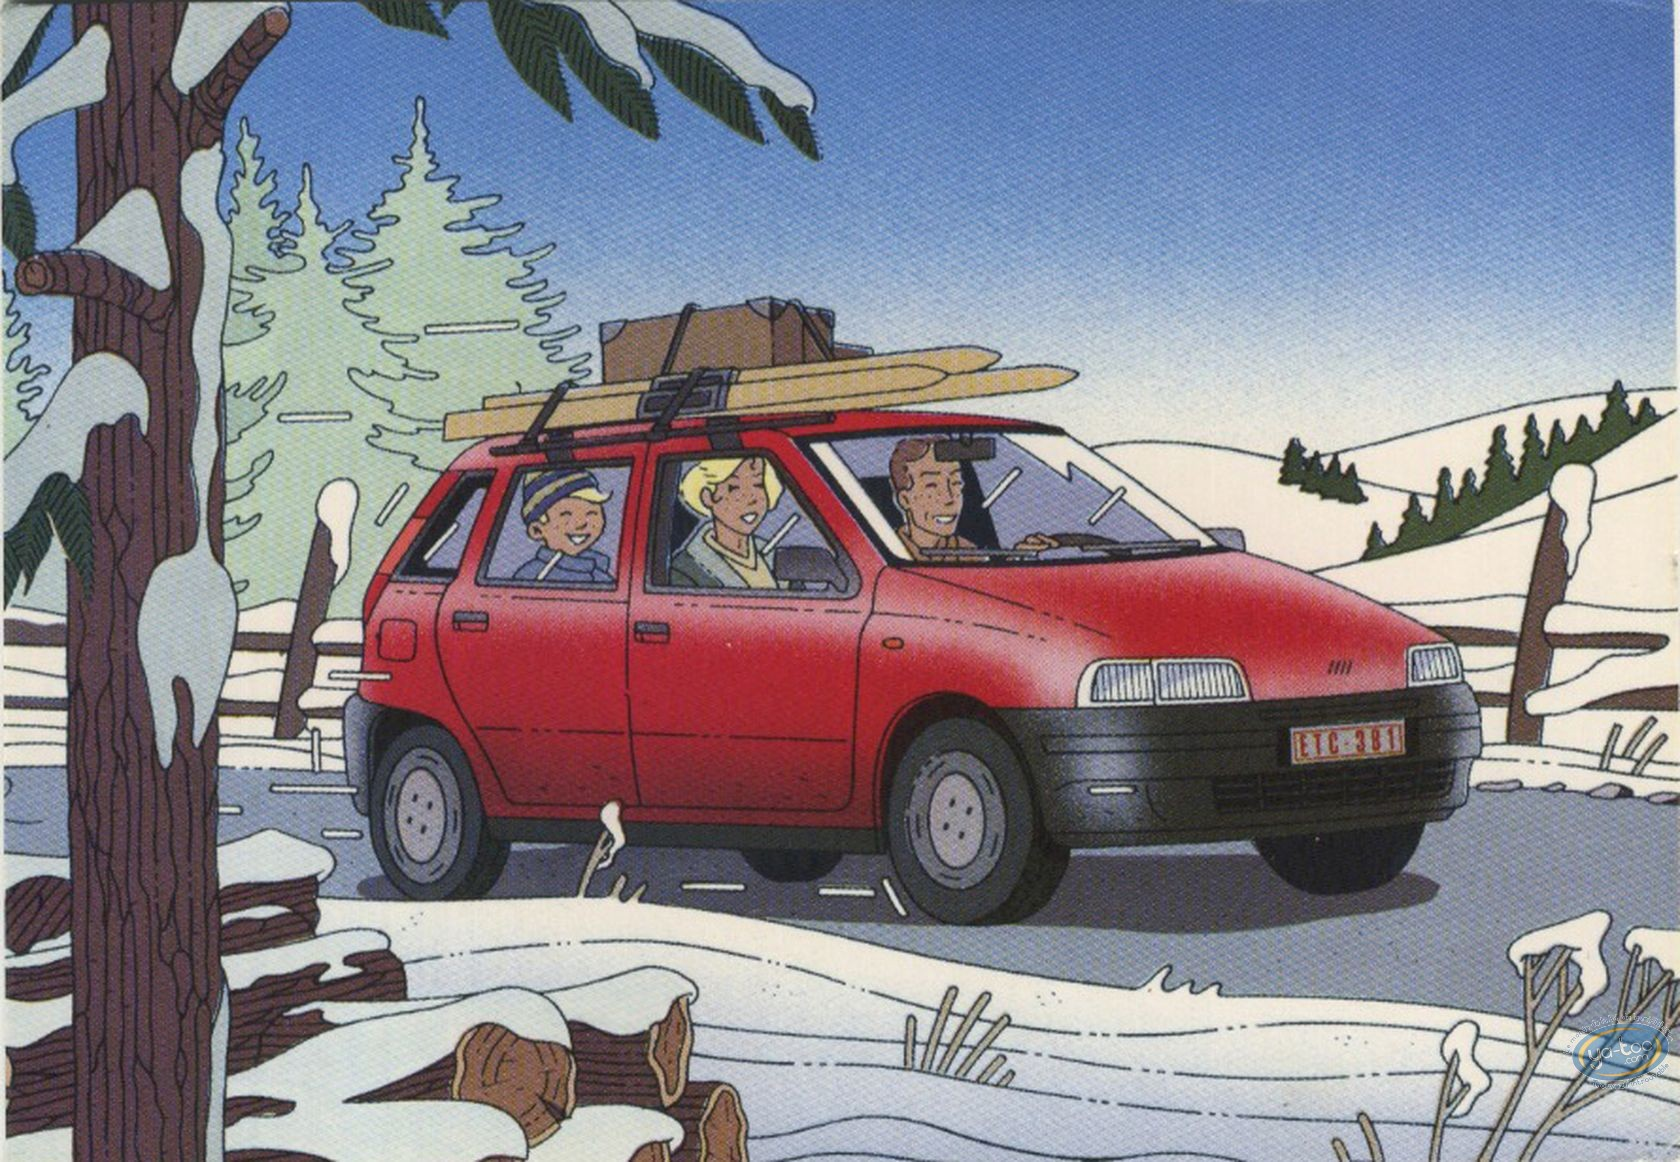 Carte postale  Carte publicitaire Diverse artikelen Fiat Punto par Goffin Boeken, strips, tijdschriften